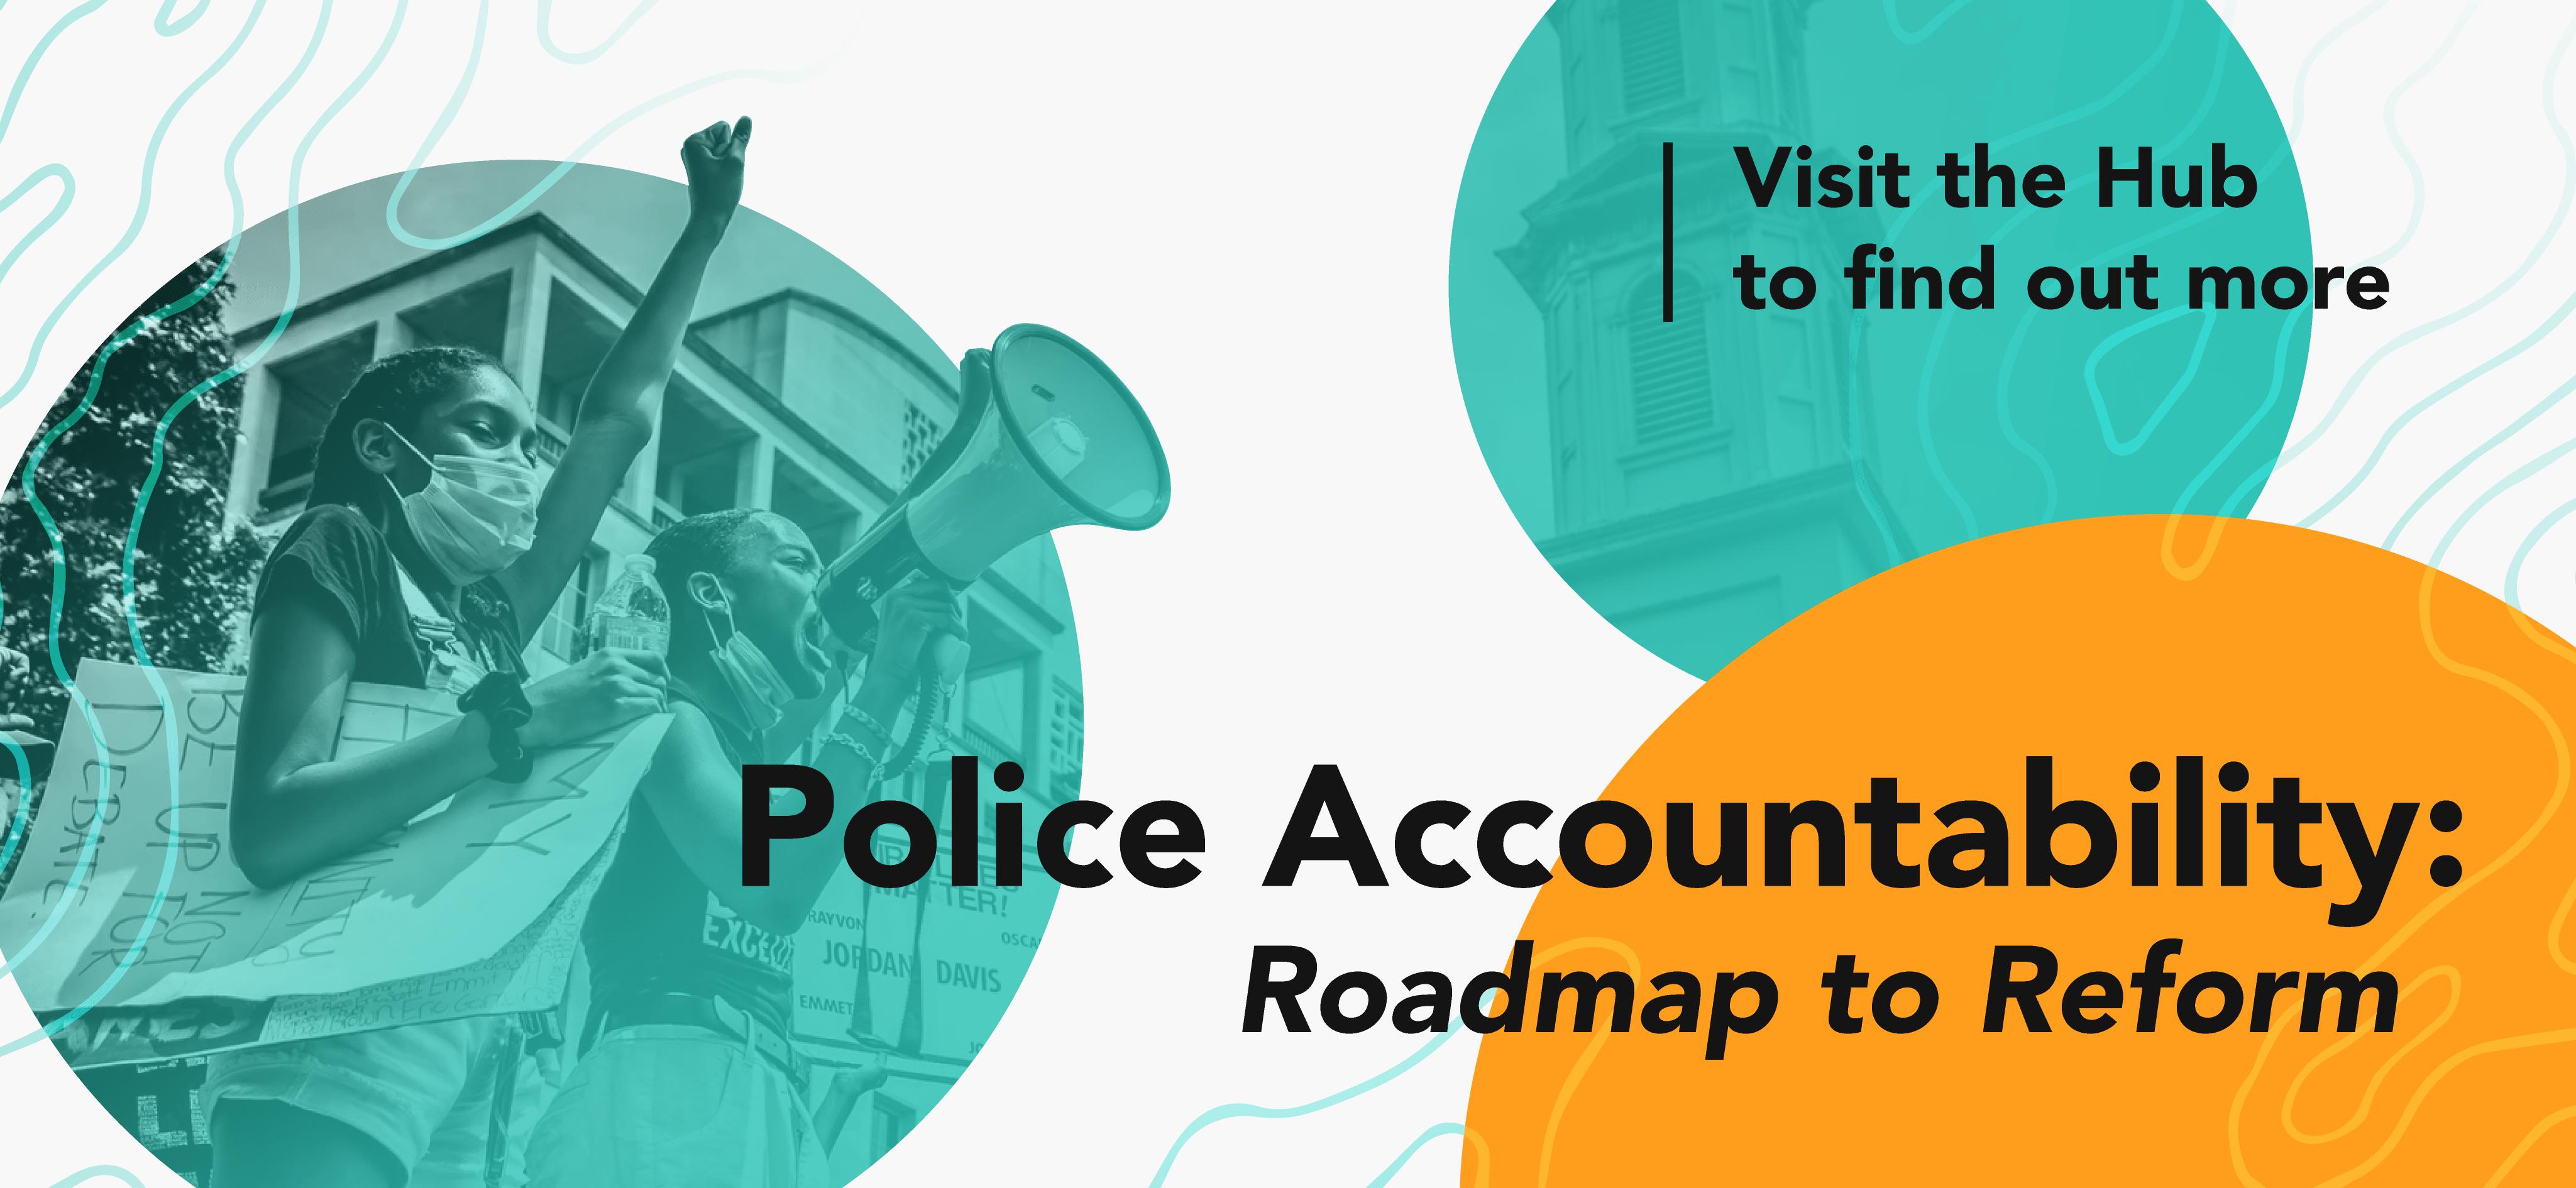 Police Accountability - Roadmap to Reform